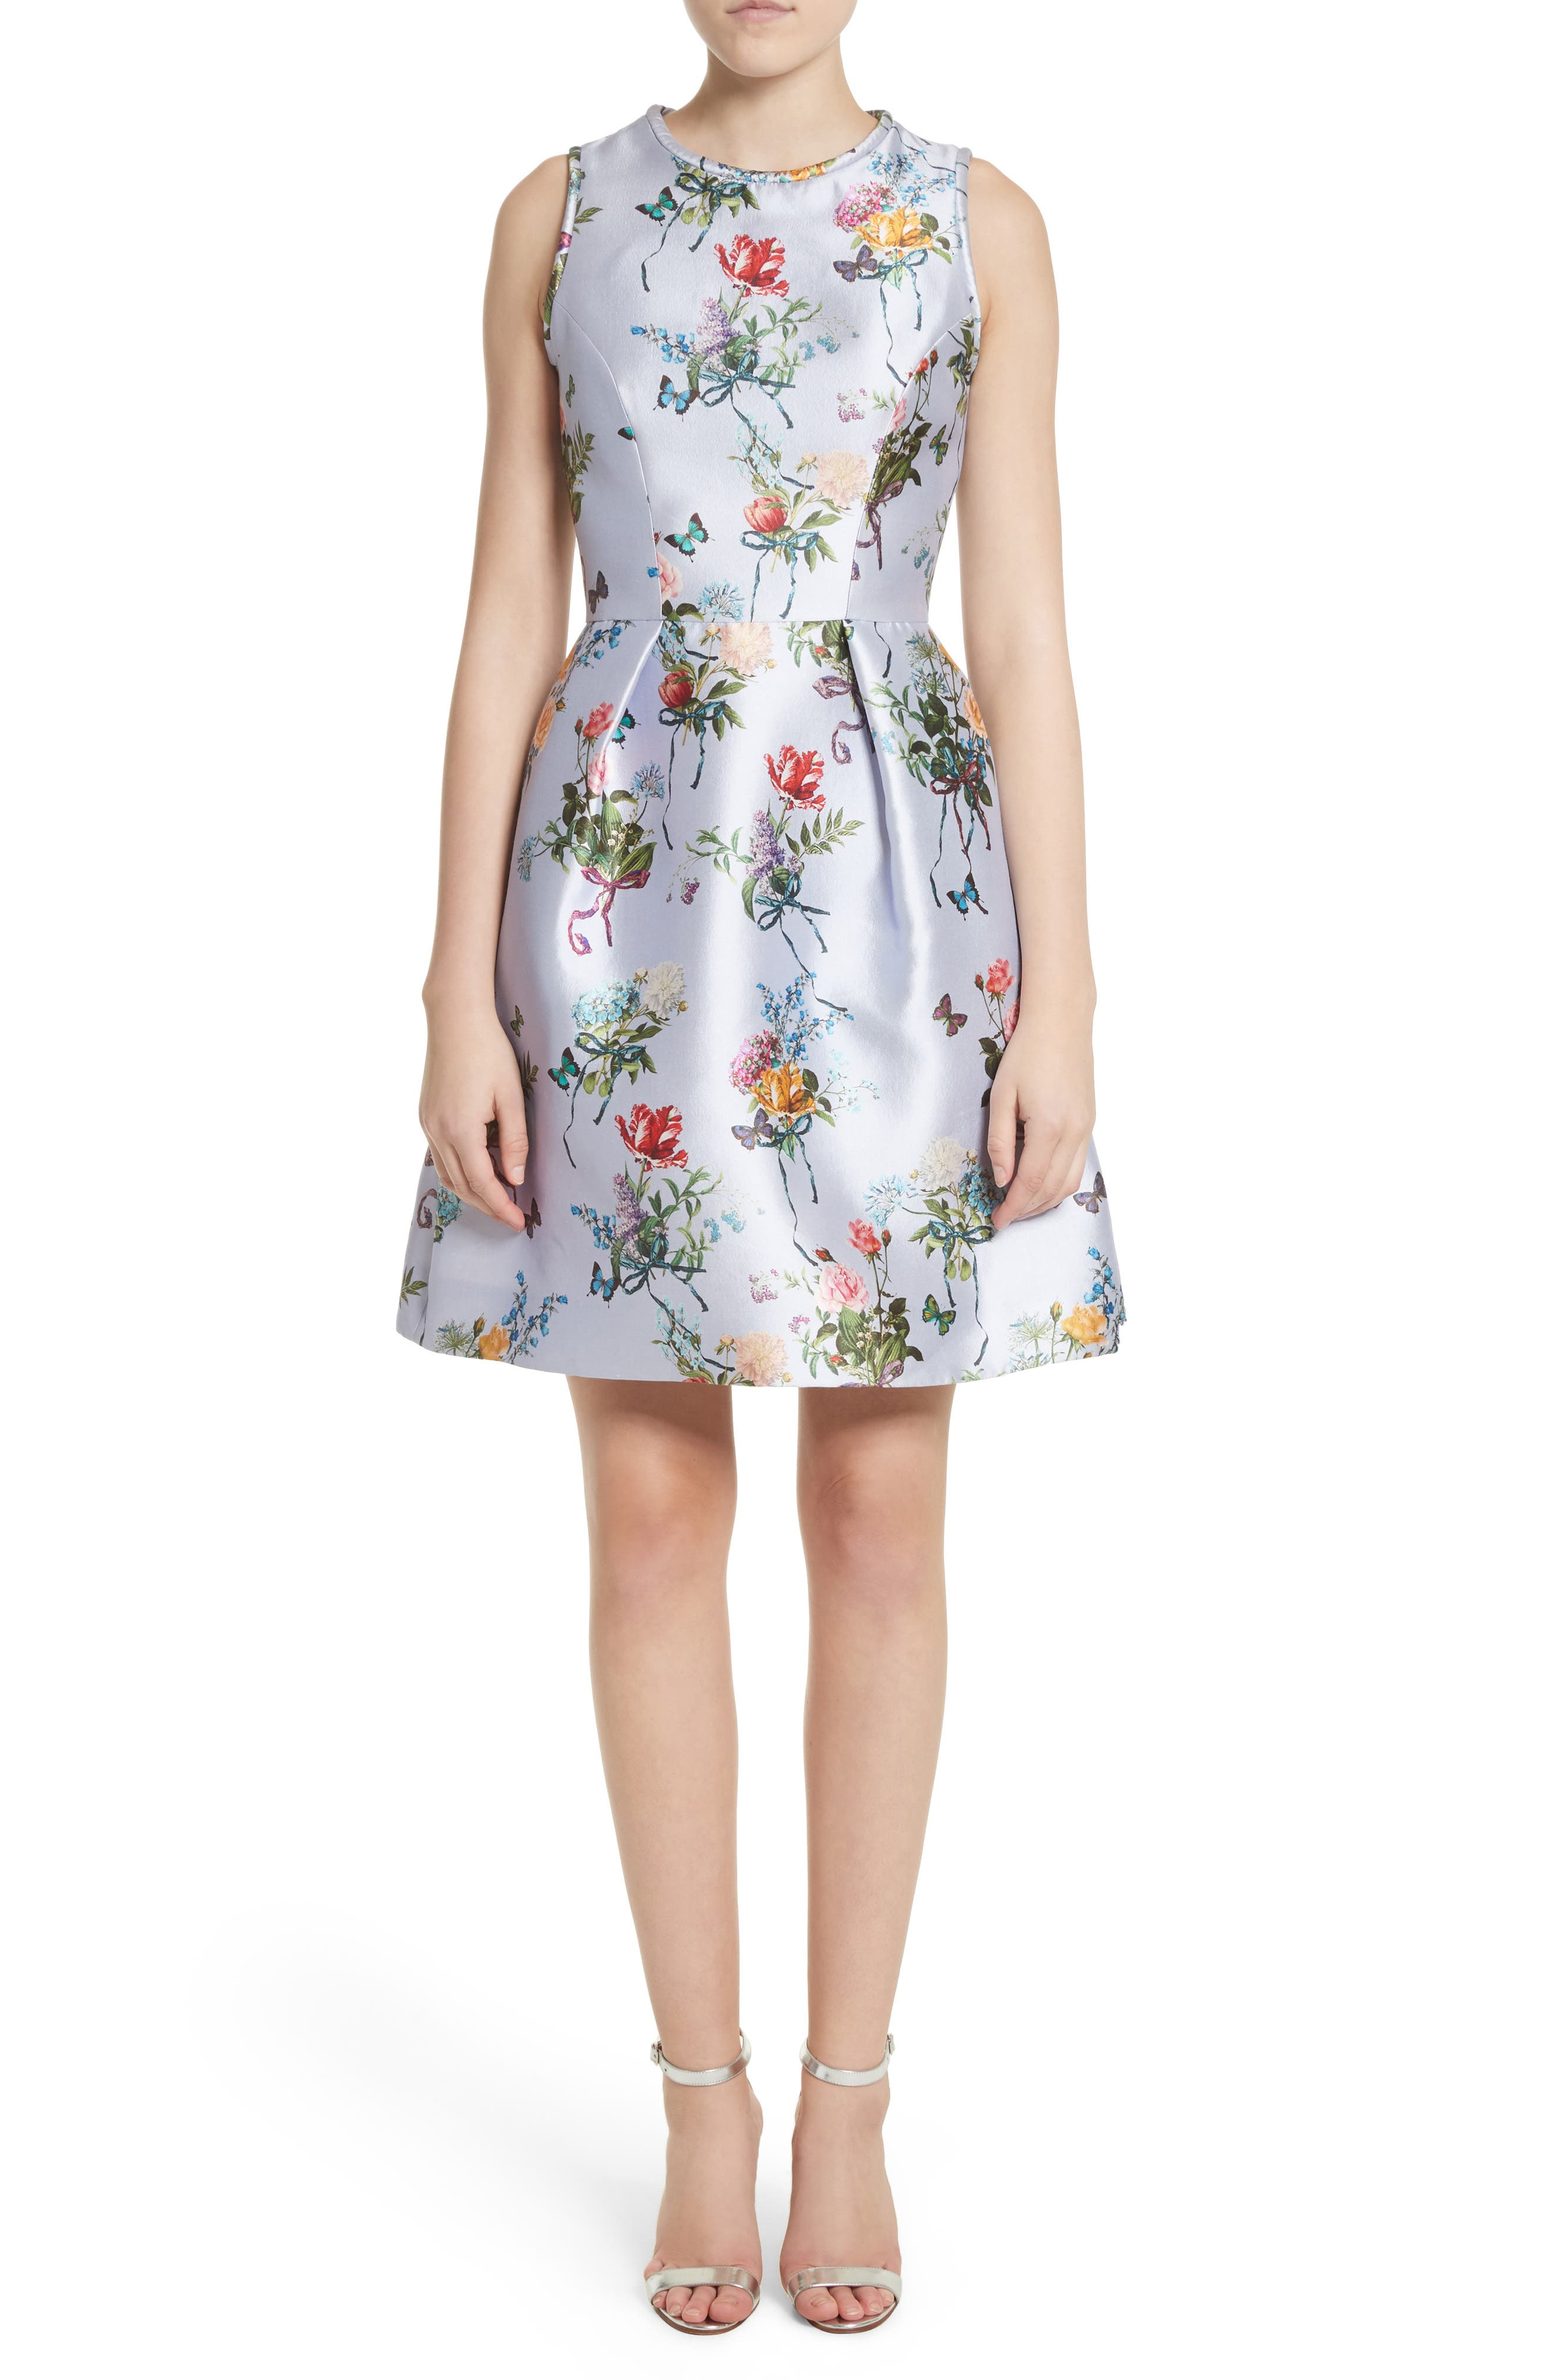 Monique Lhuillier Botantical Print Structured Twill Dress